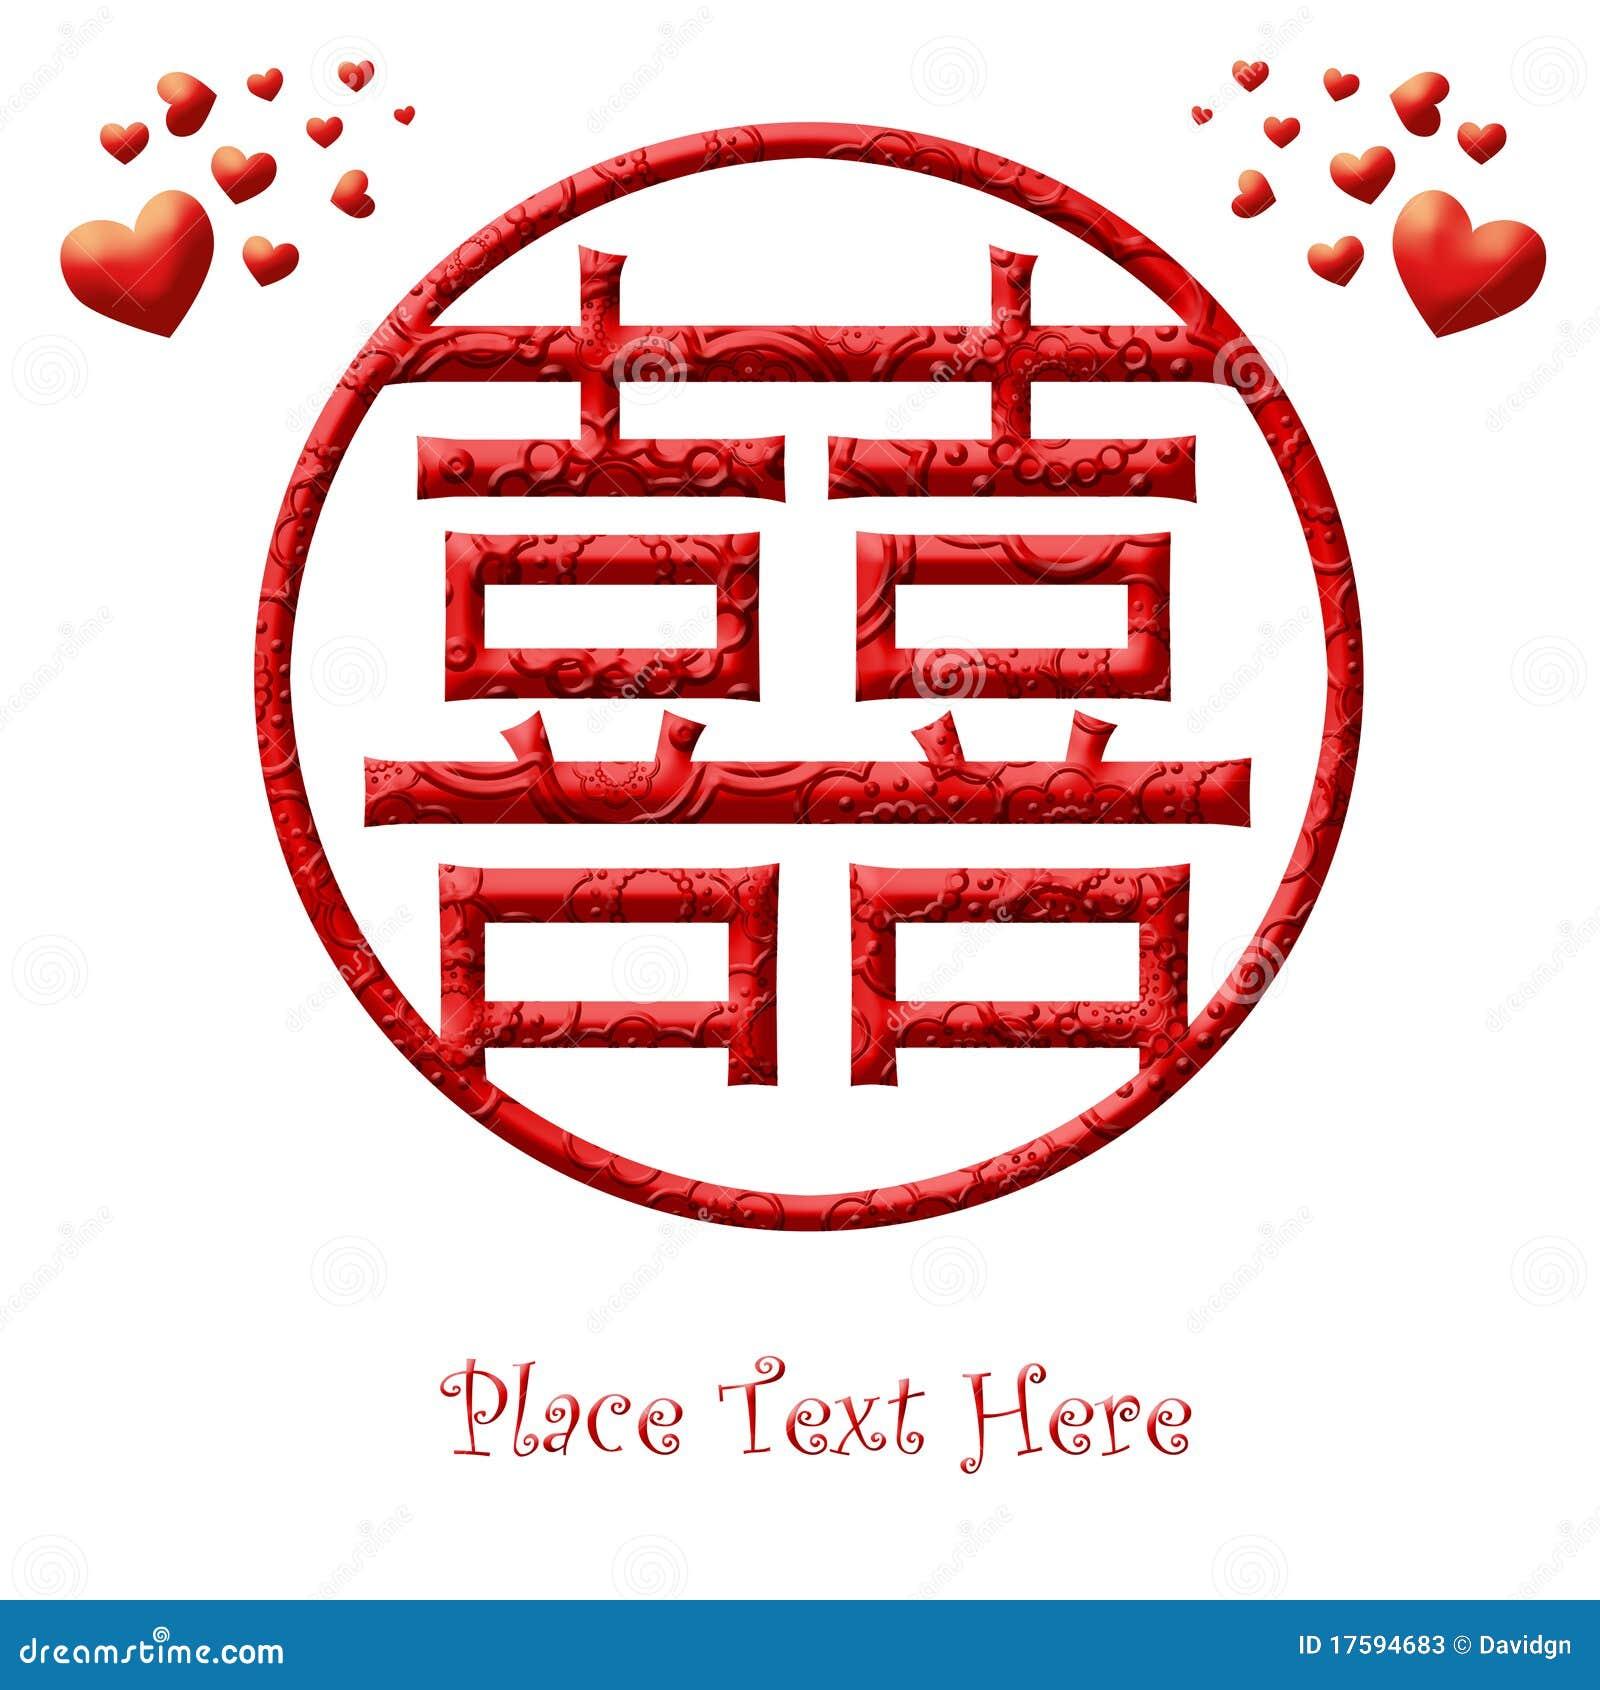 Love Double Happiness Chinese Wedding Symbols Stock Illustration